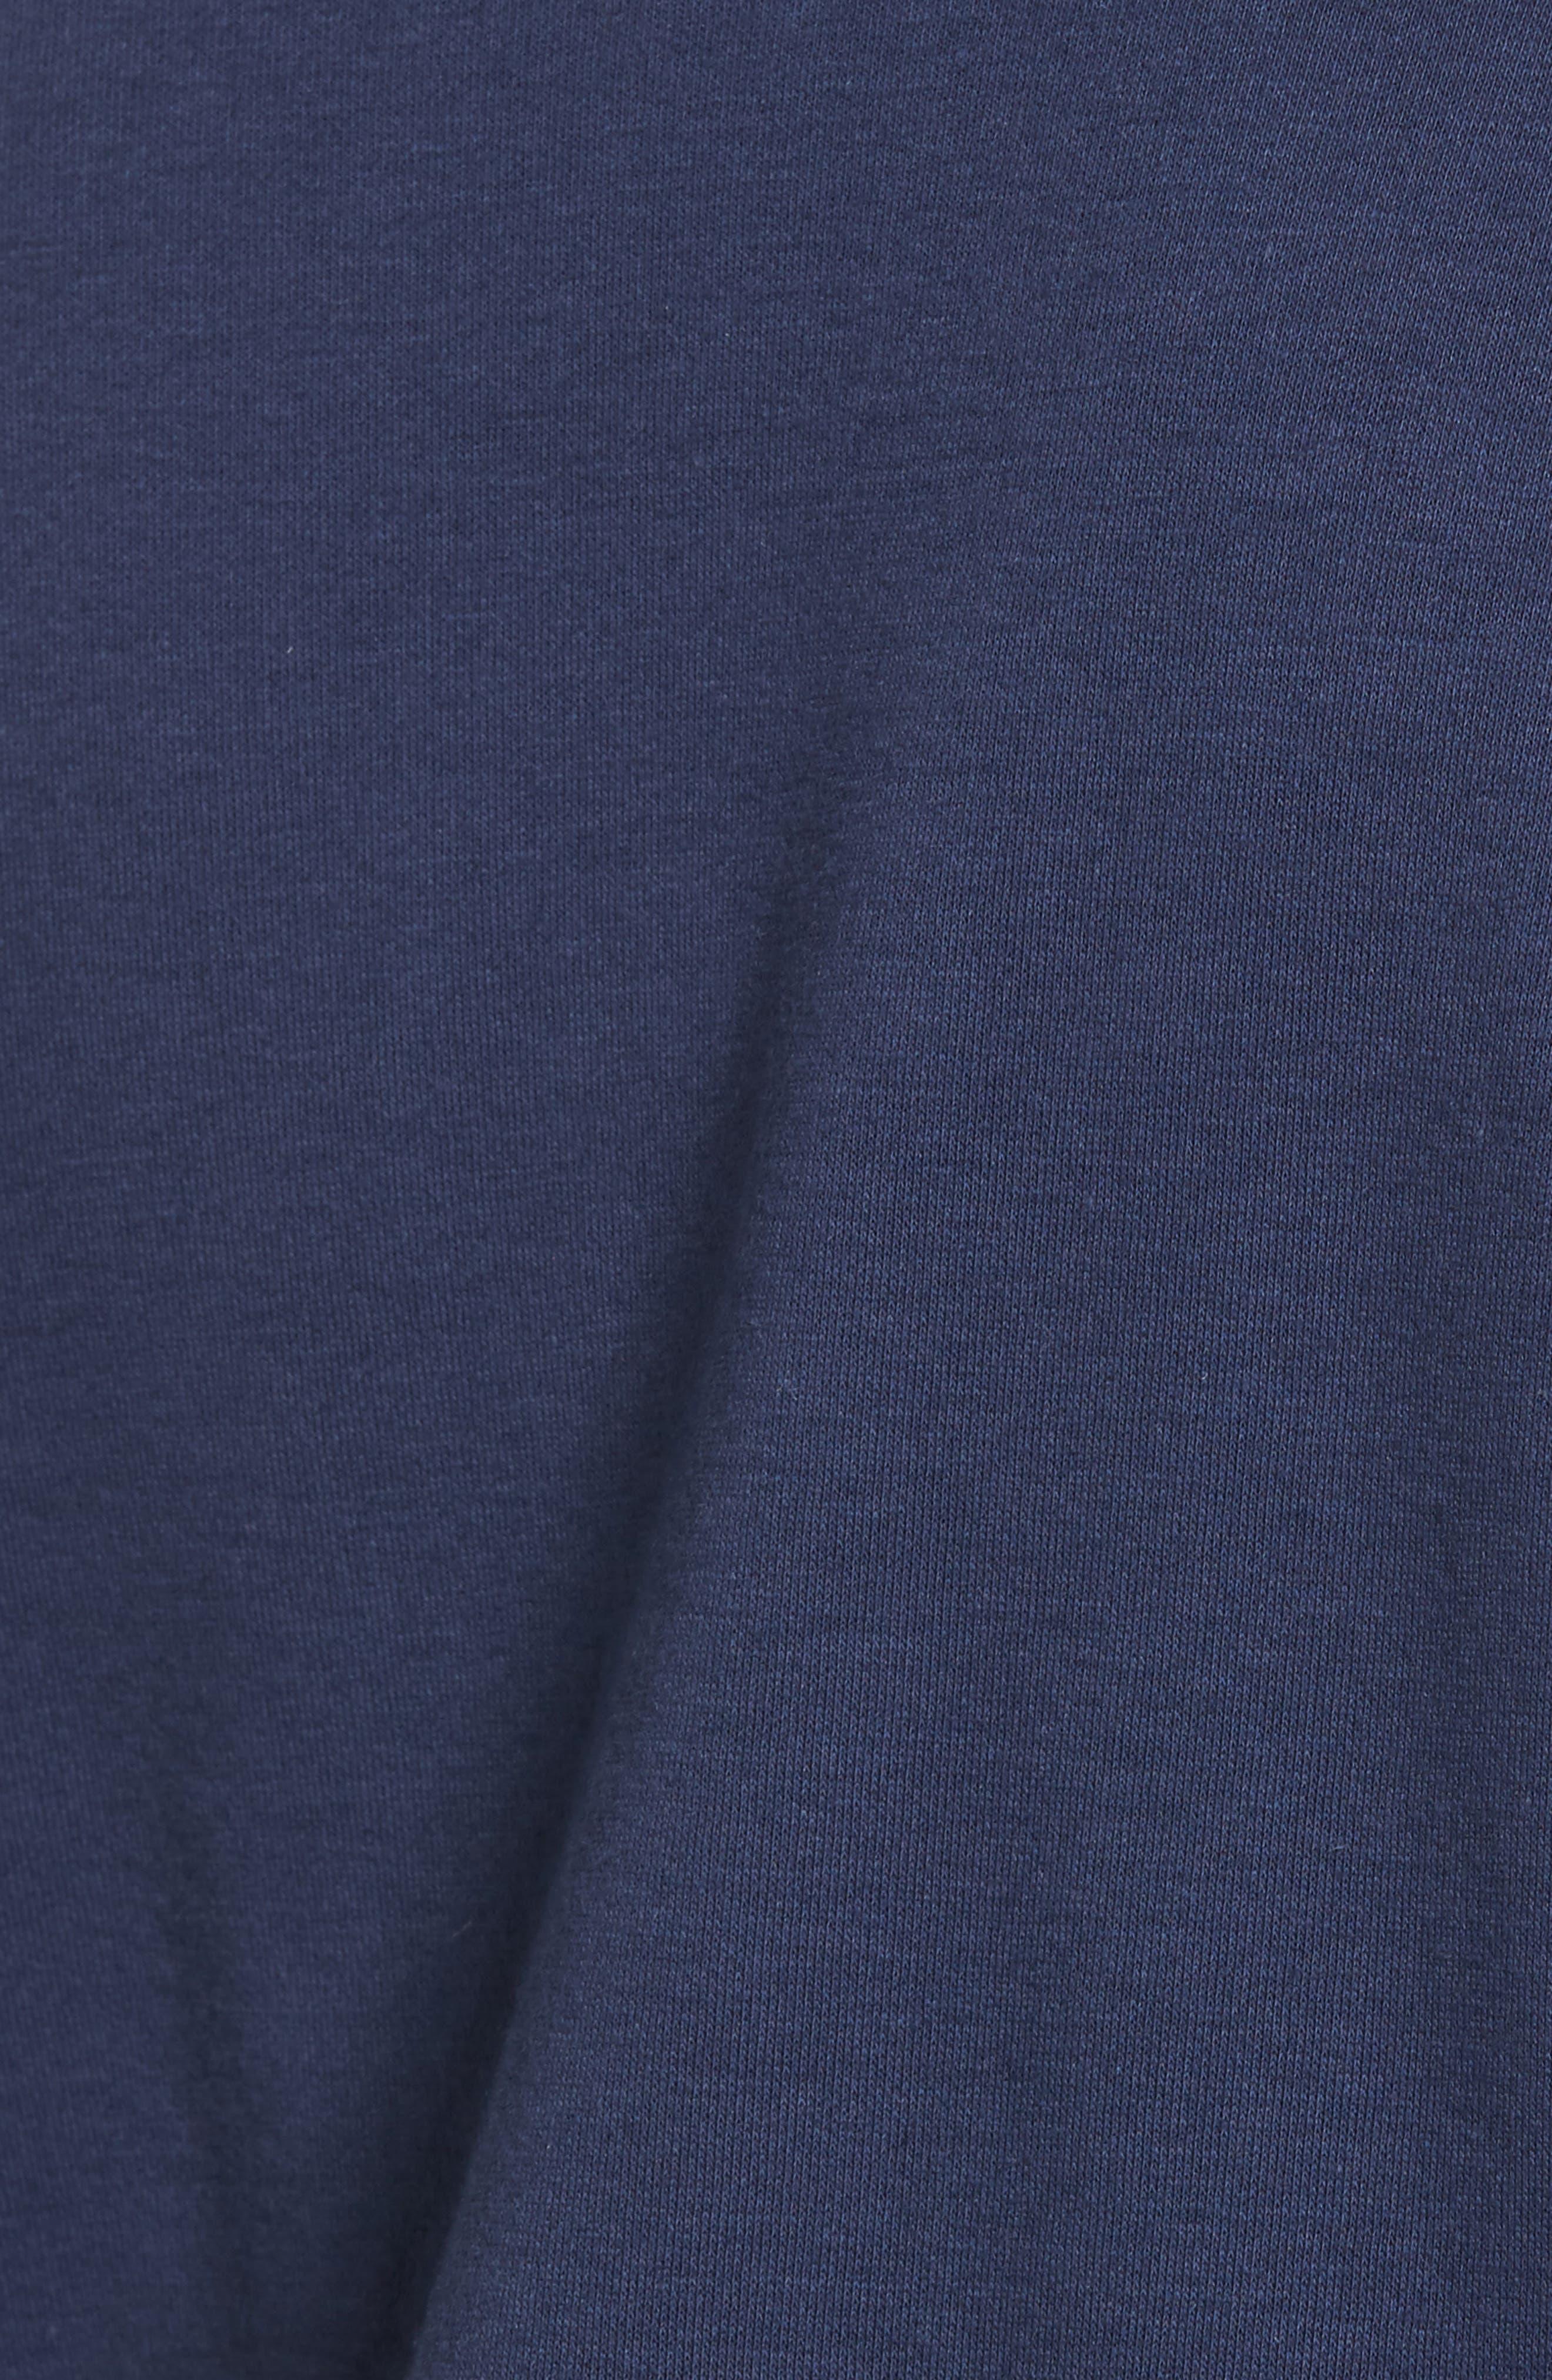 Ruched Sleeve Poplin Trim Sweatshirt,                             Alternate thumbnail 19, color,